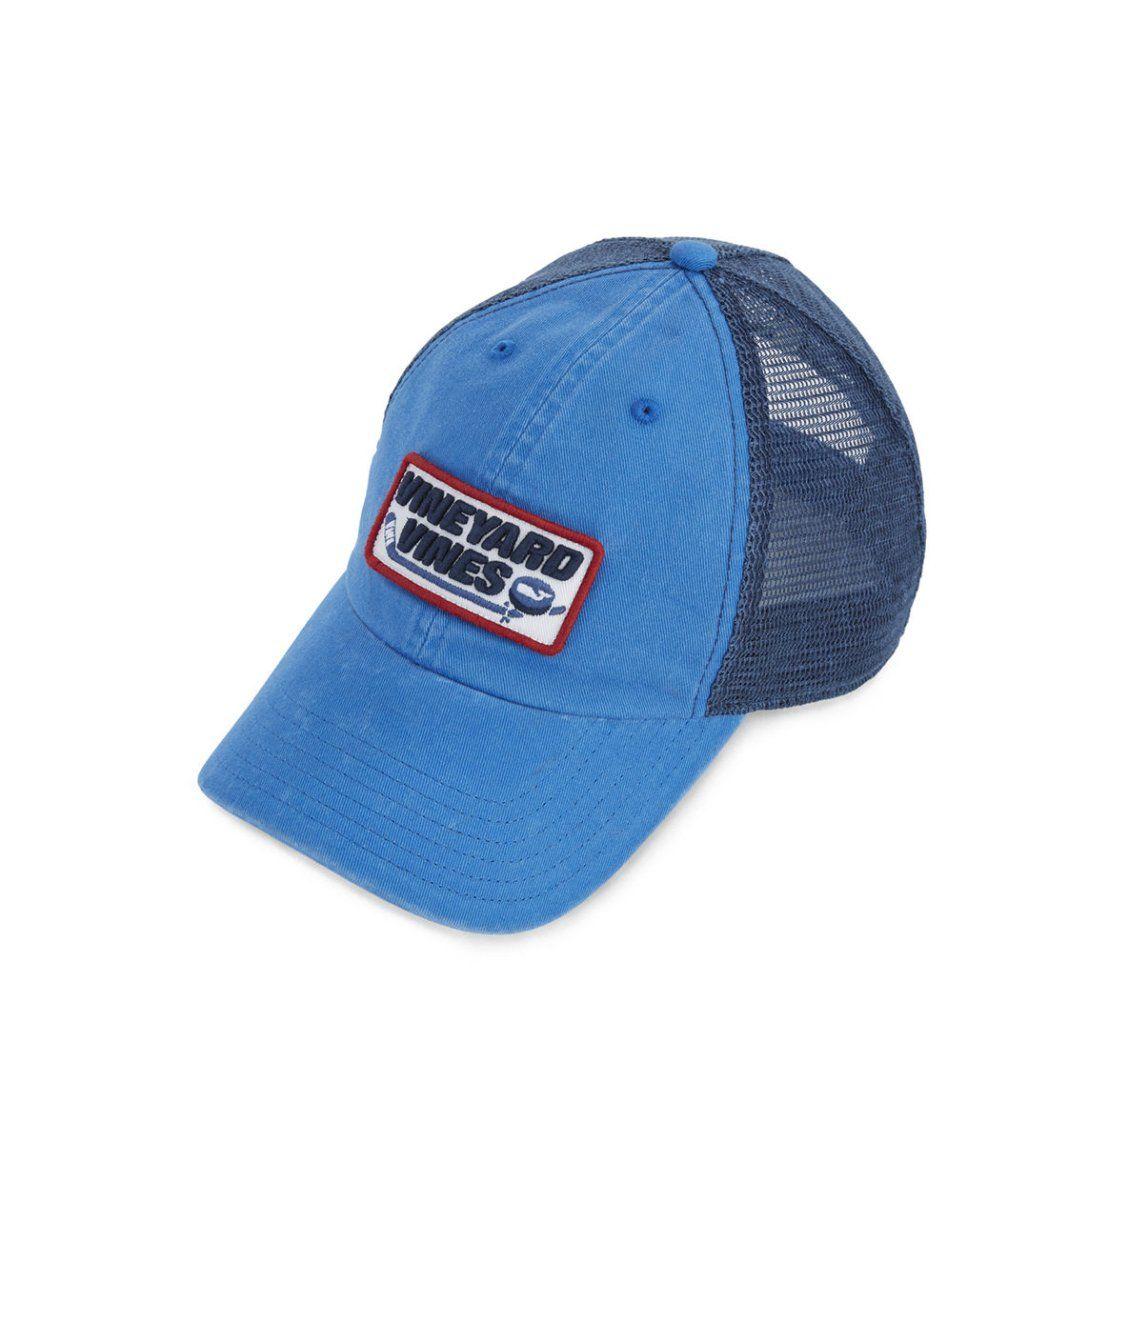 09b06418d90 Hockey Patch Trucker Hat | new arrivals | Hats, Hats for men, Men